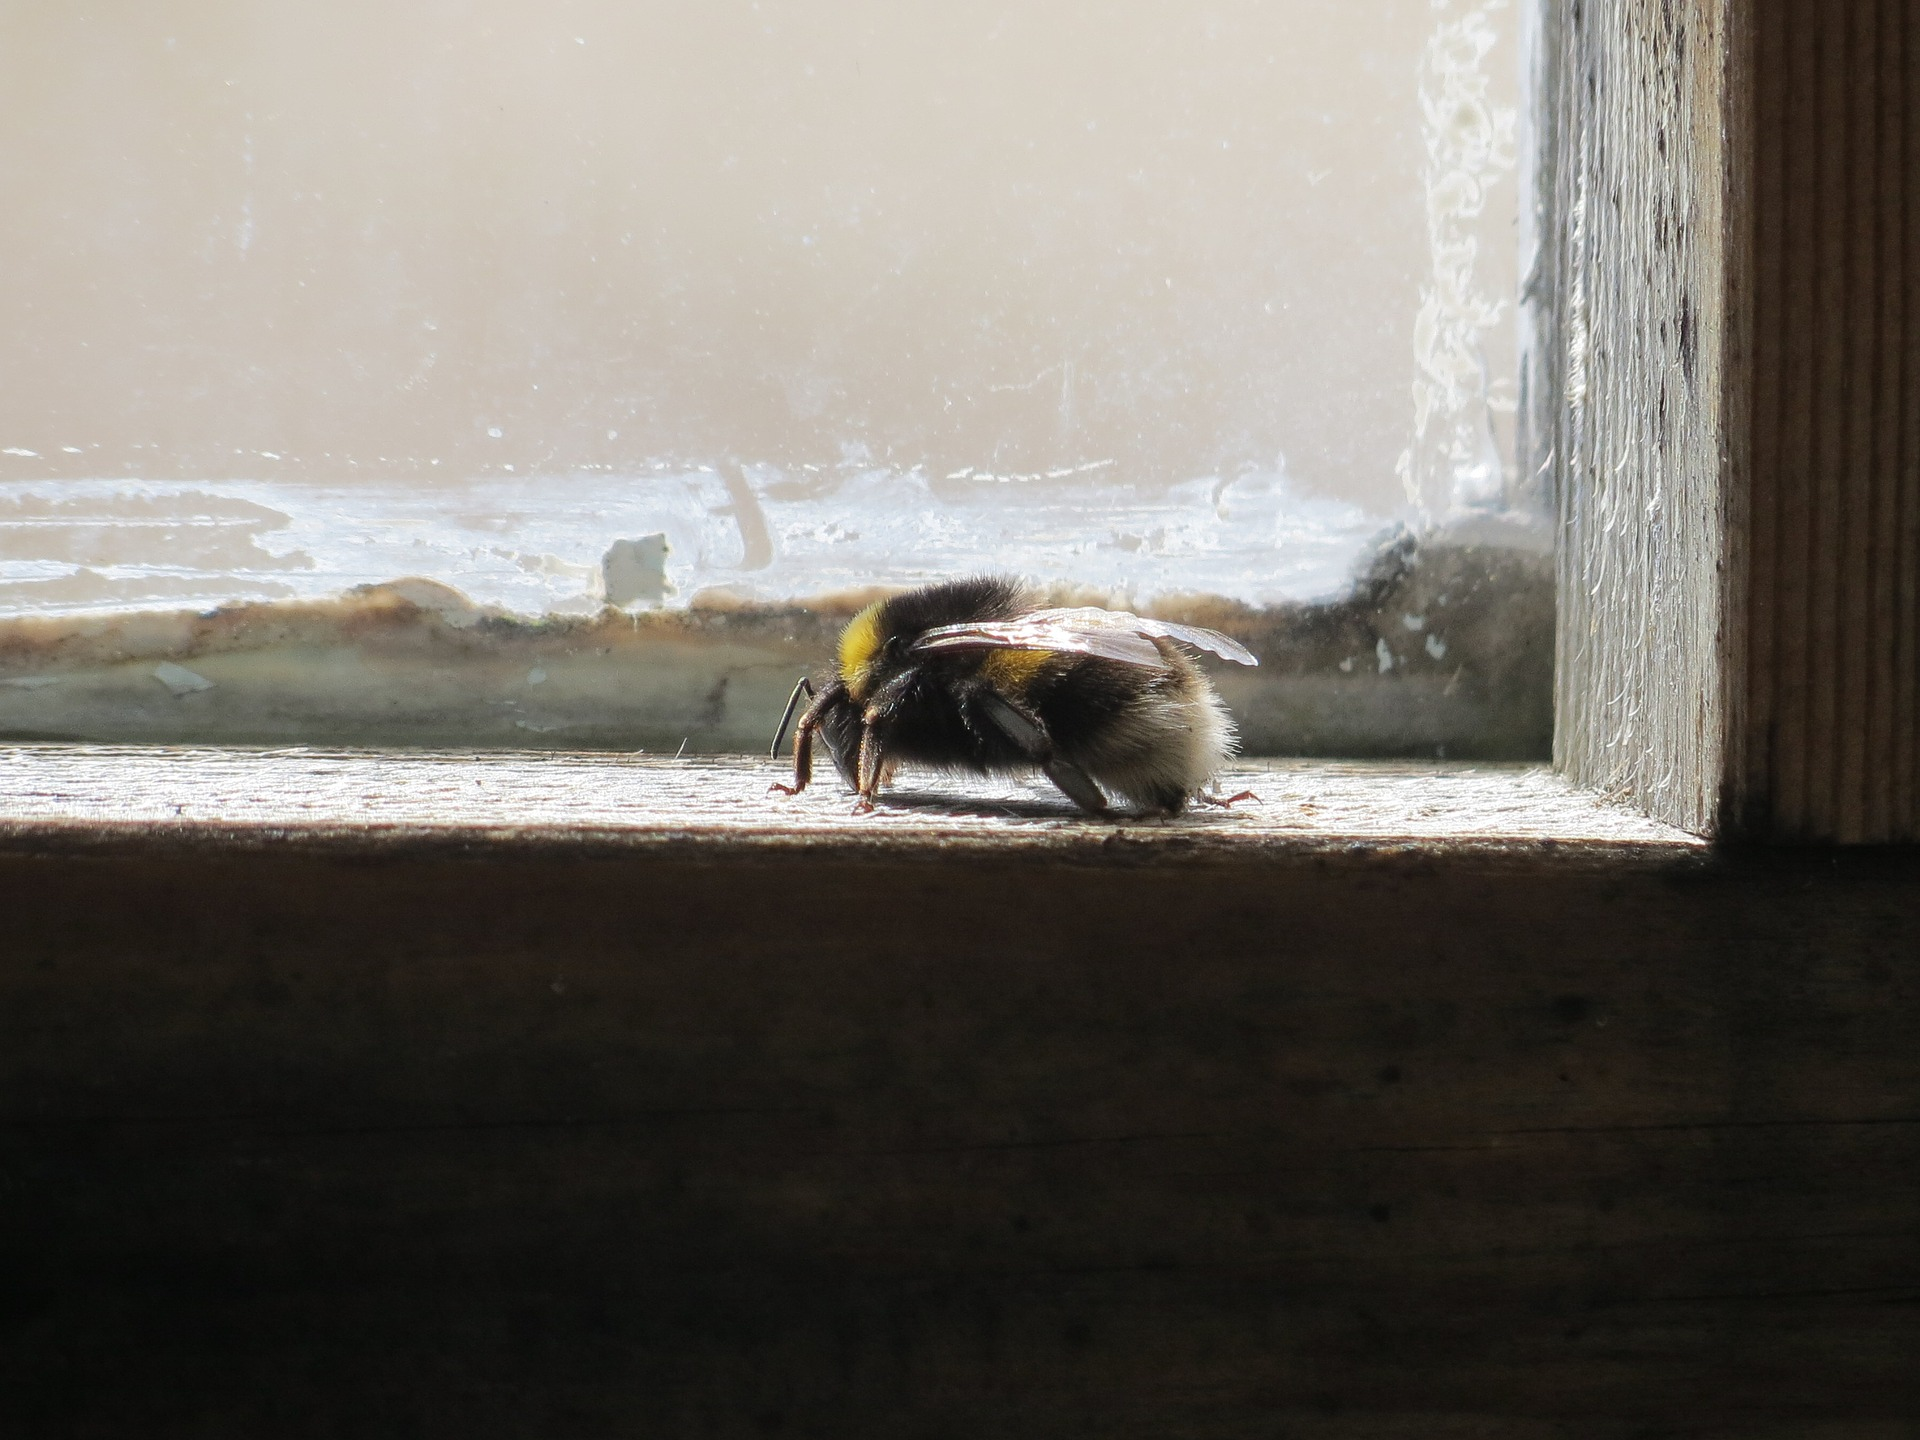 Pestizide stören natürlichen Hummelflug